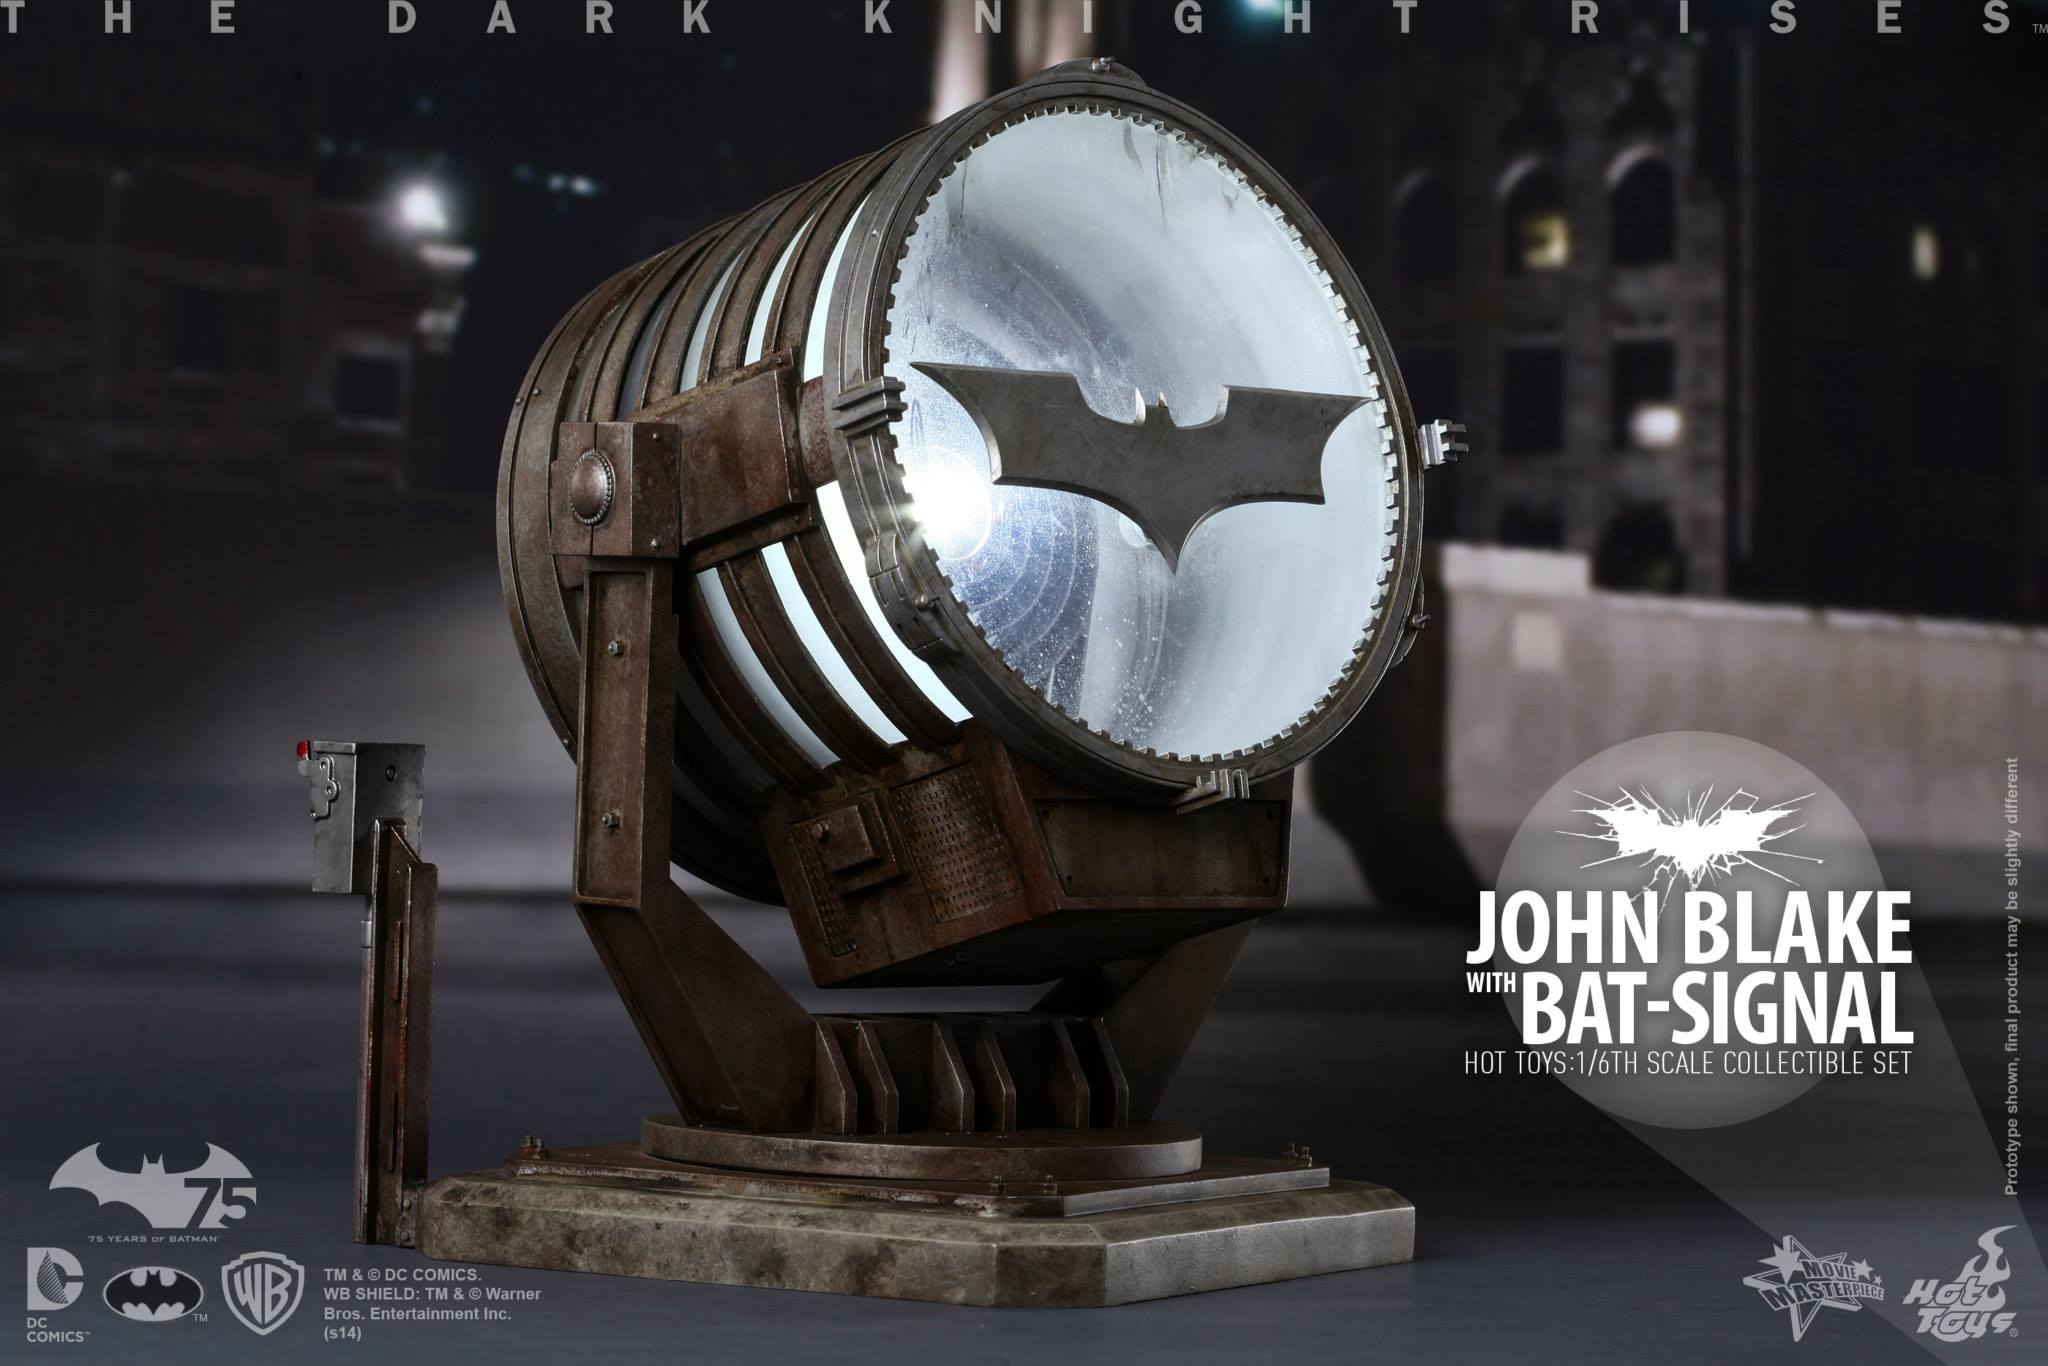 THE DARK KNIGHT RISES - Lt. JIM GORDON & JOHN BLAKE w/BATSIGNAL 950716103